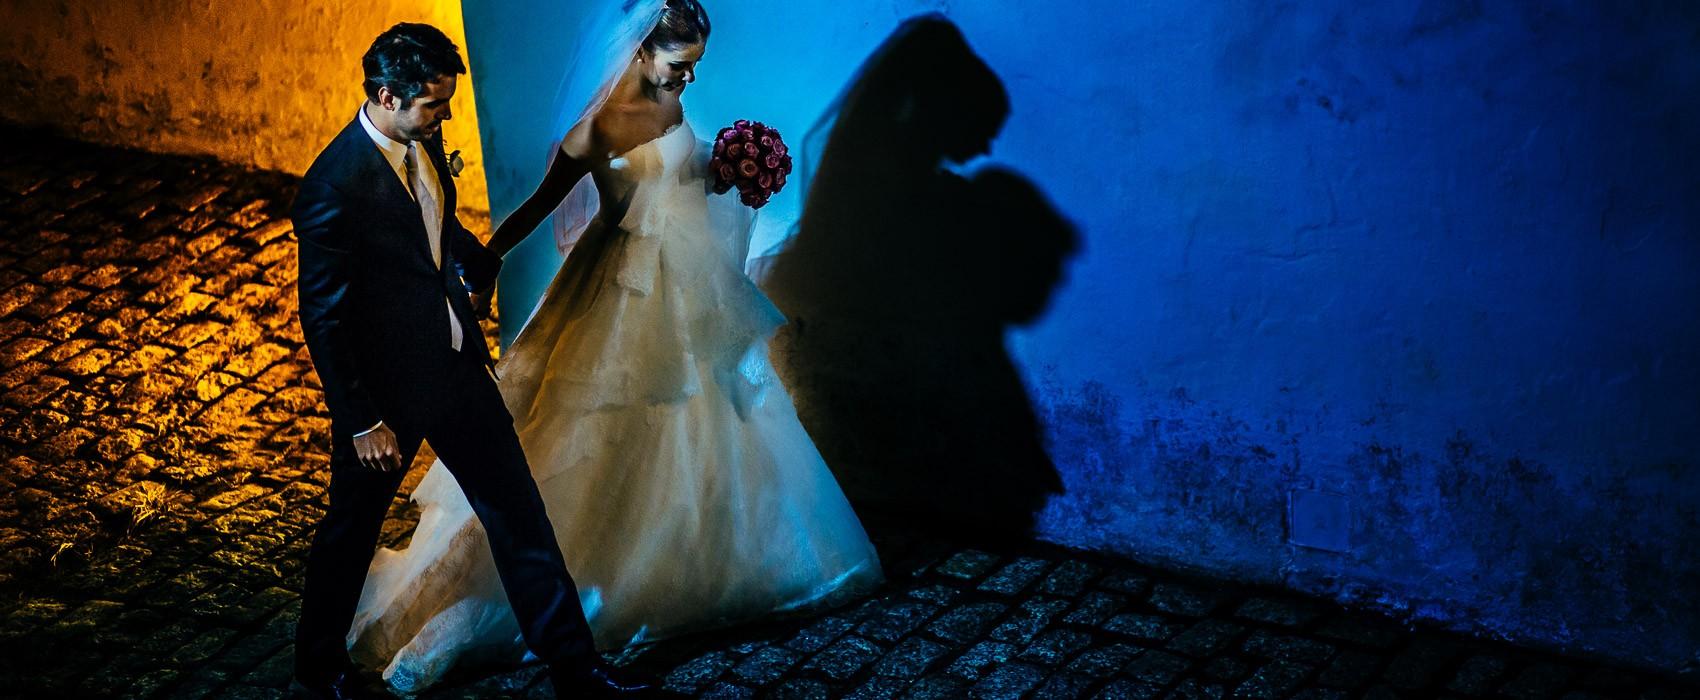 fotografo casamento florianopolis renato dpaula